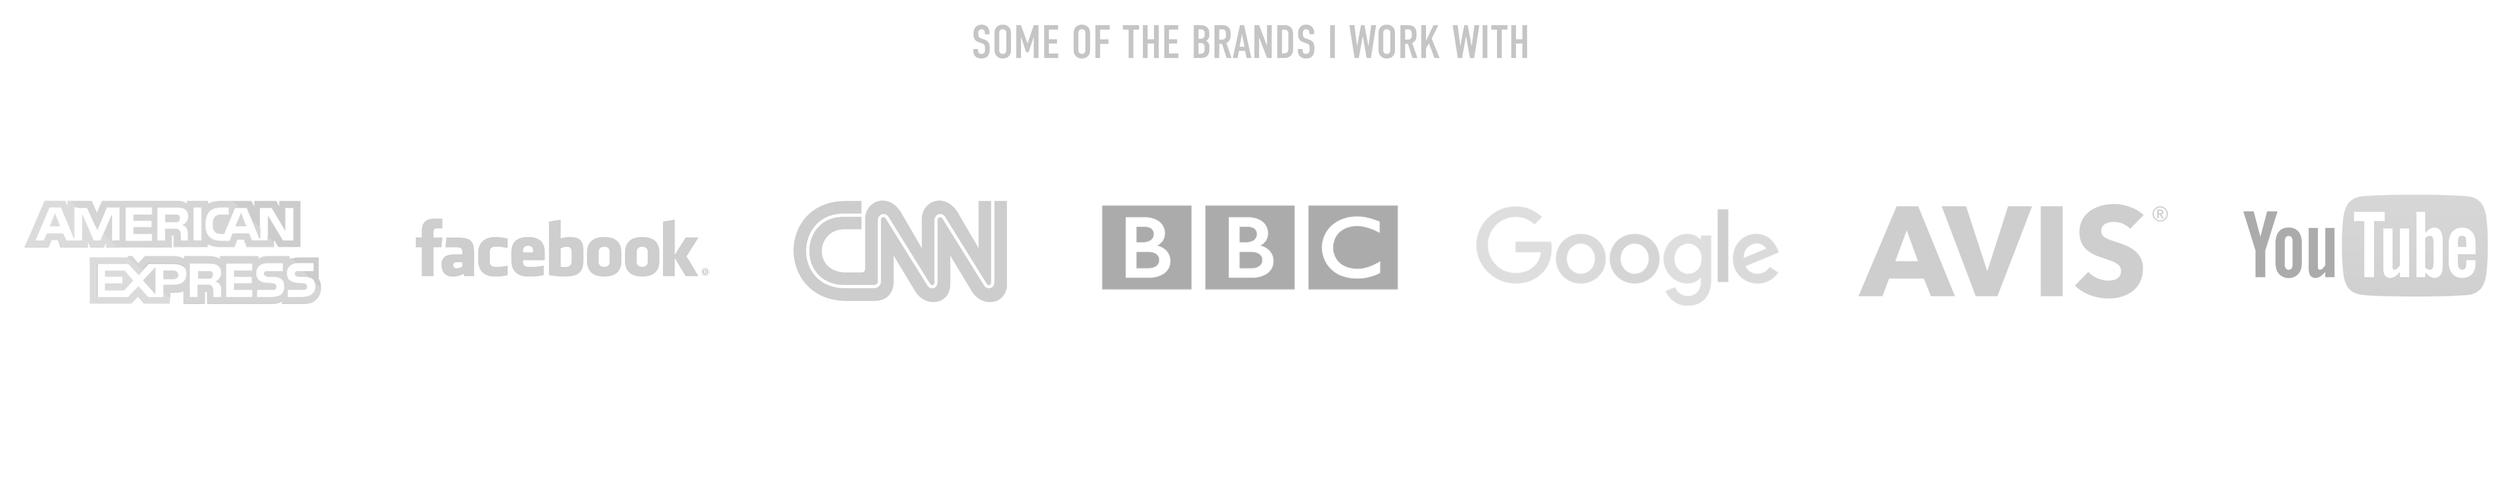 brands 02.png